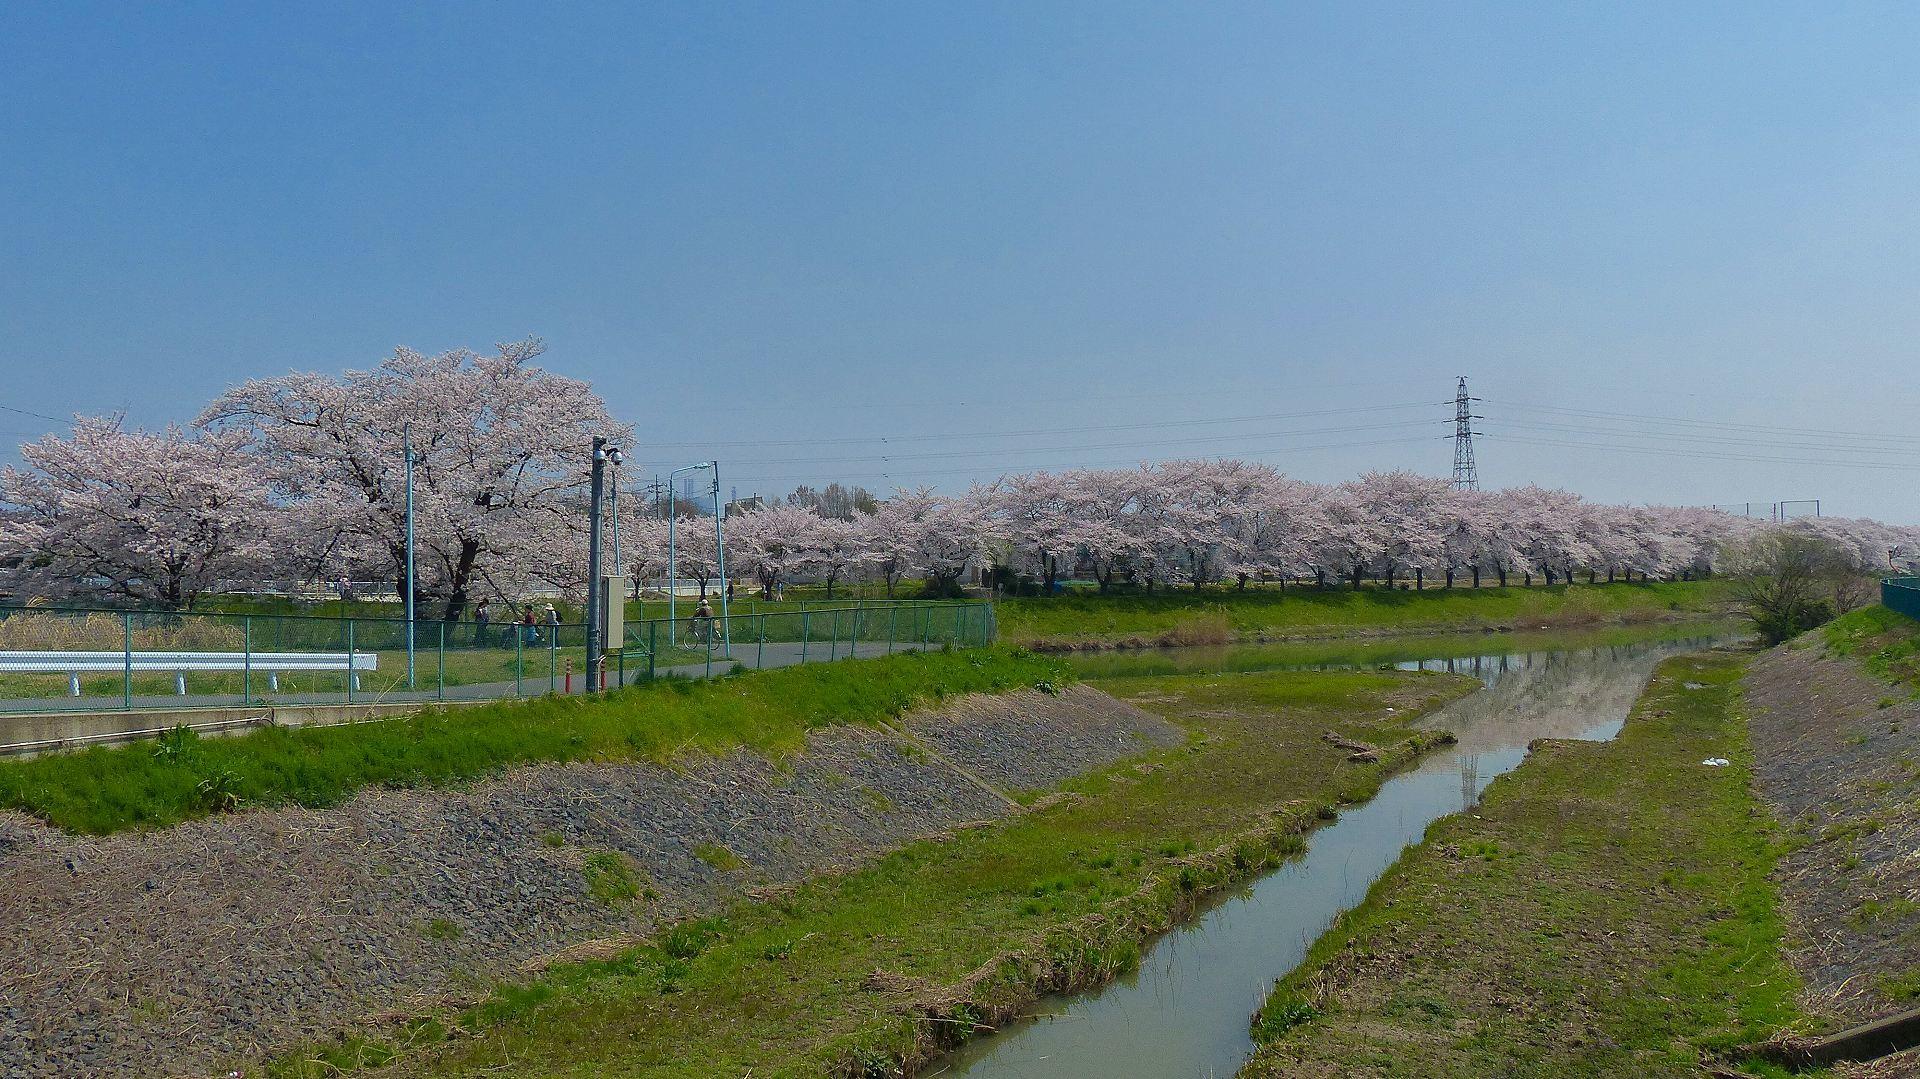 満開の桜を堪能! 【 2018 3/28(水) 】_a0185081_19295119.jpg